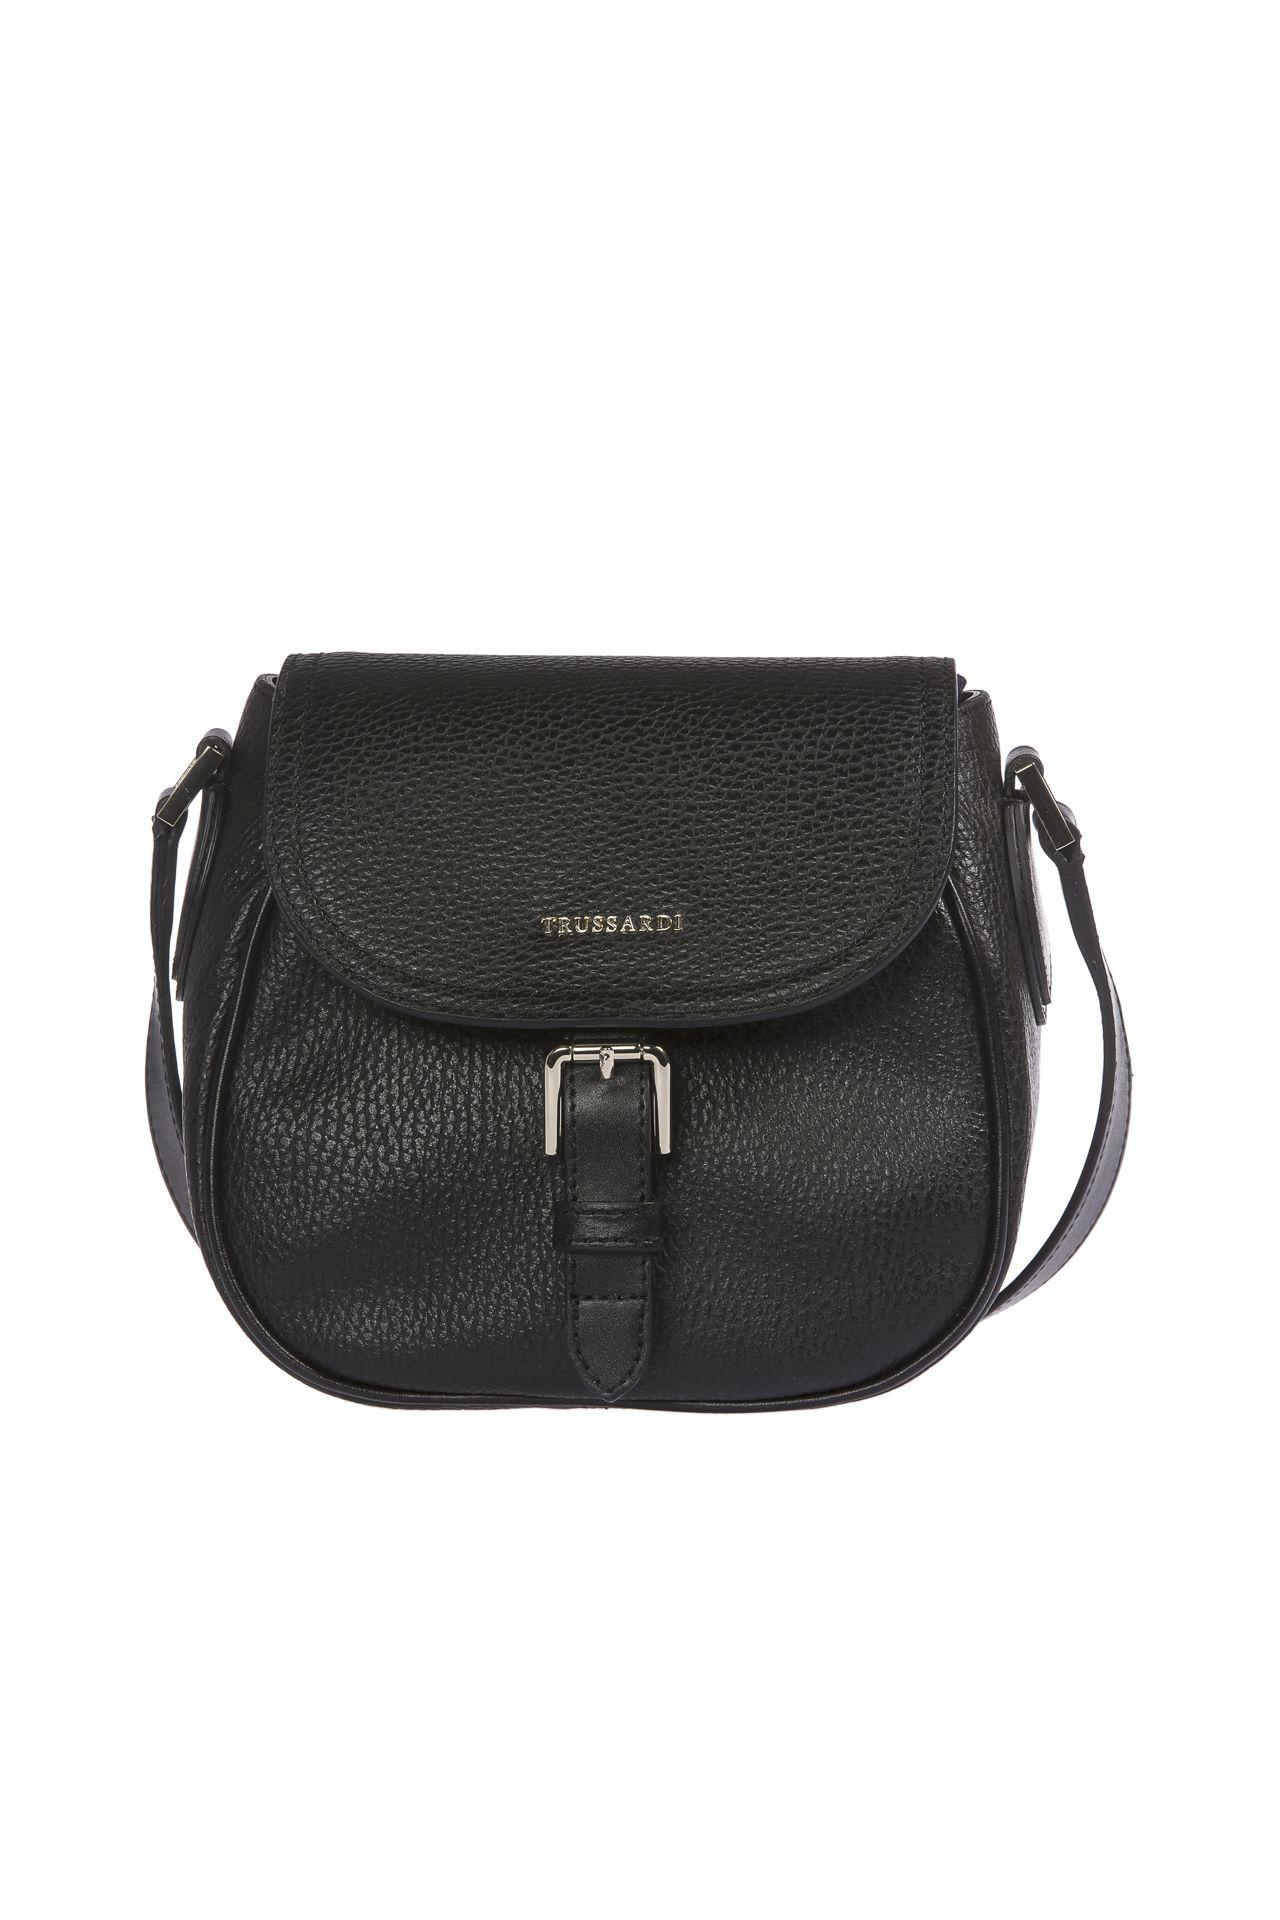 Trussardi Women's Crossbody Bag Black 1DB513_19Black